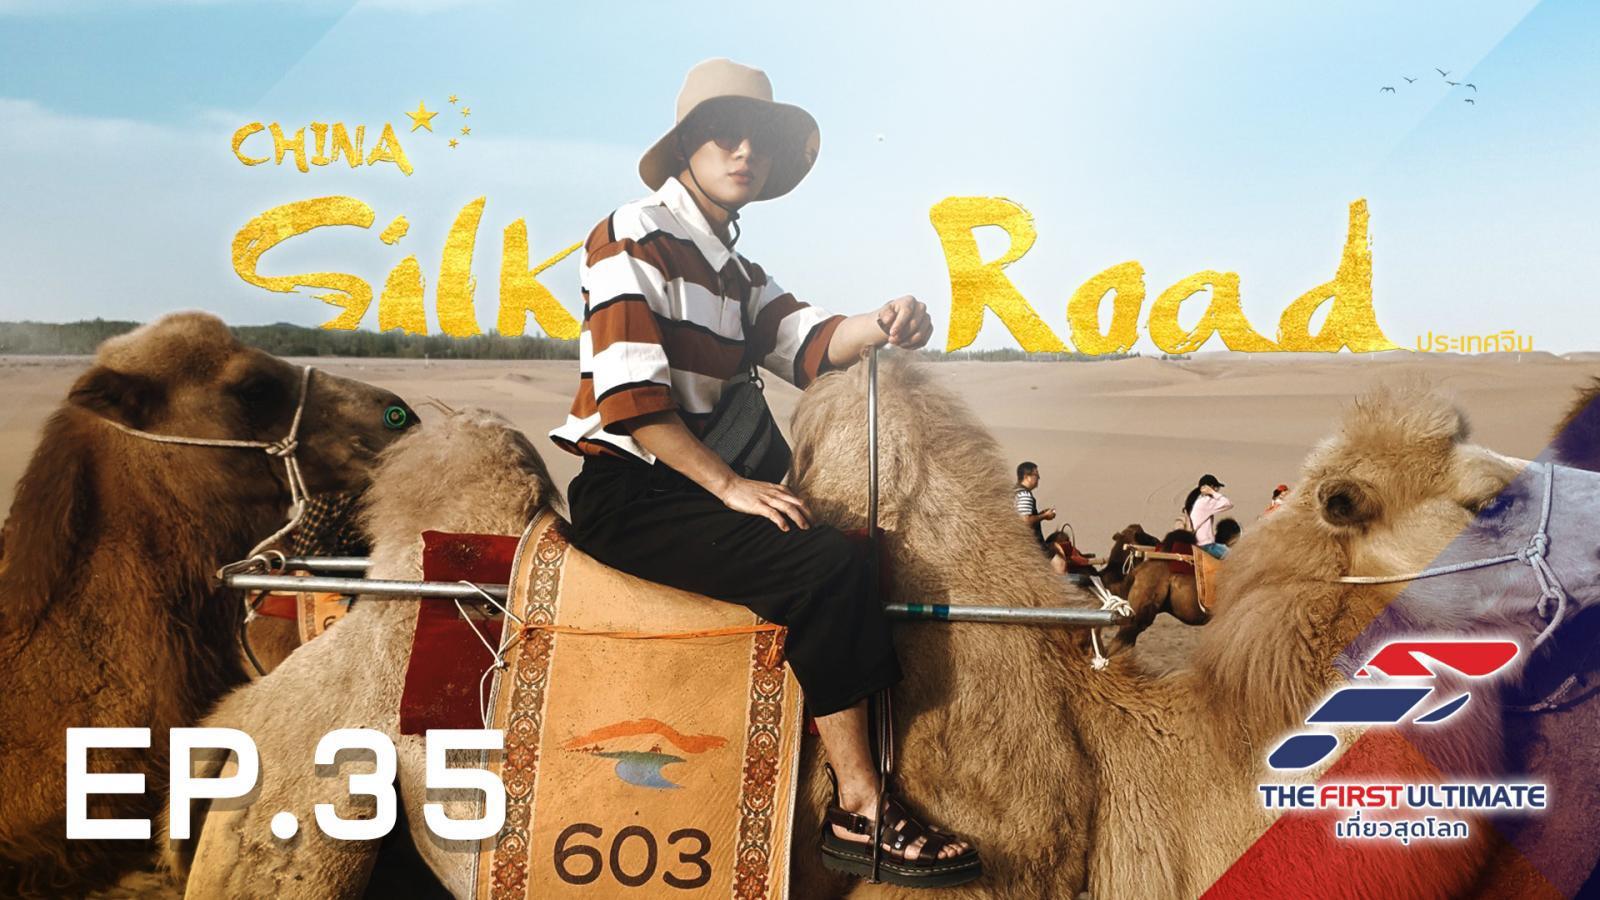 China Silk Road ตอน 3